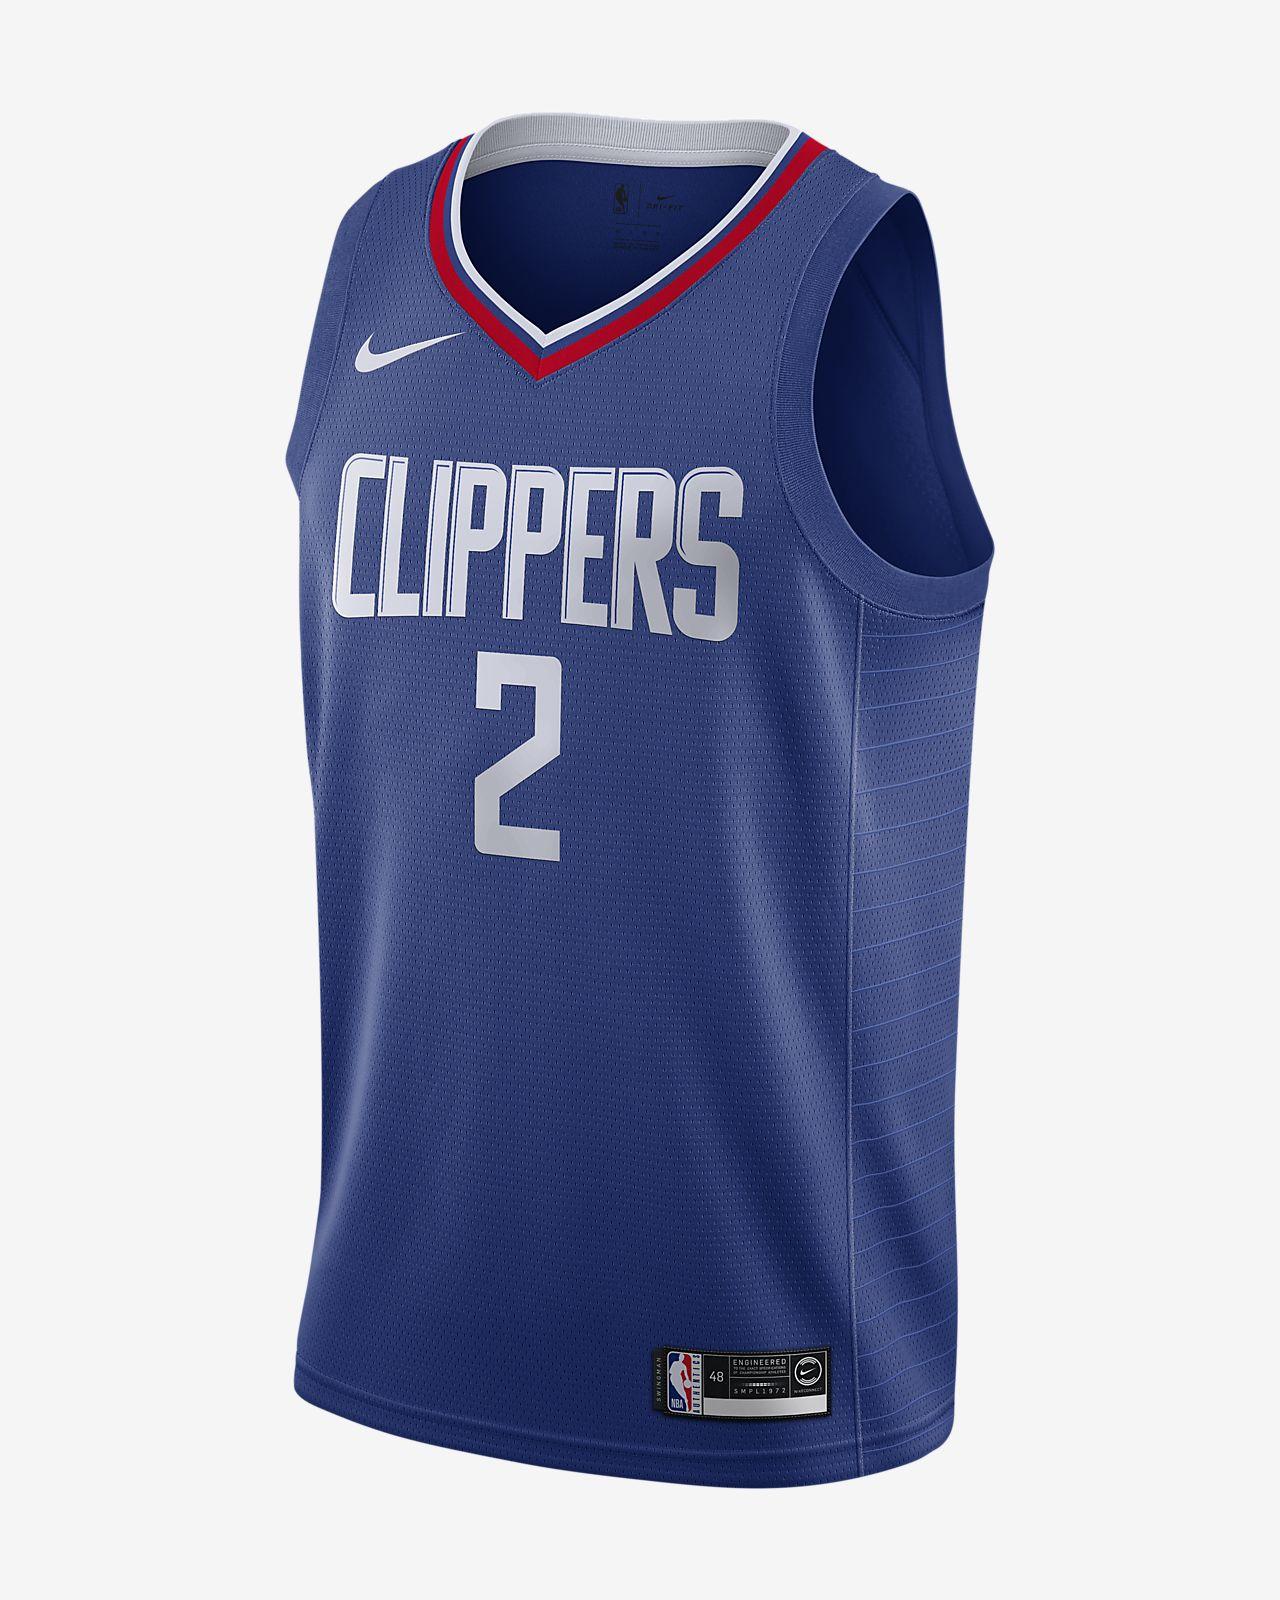 Kawhi Leonard Icon Edition Swingman (Los Angeles Clippers) Nike NBA Connected Trikot